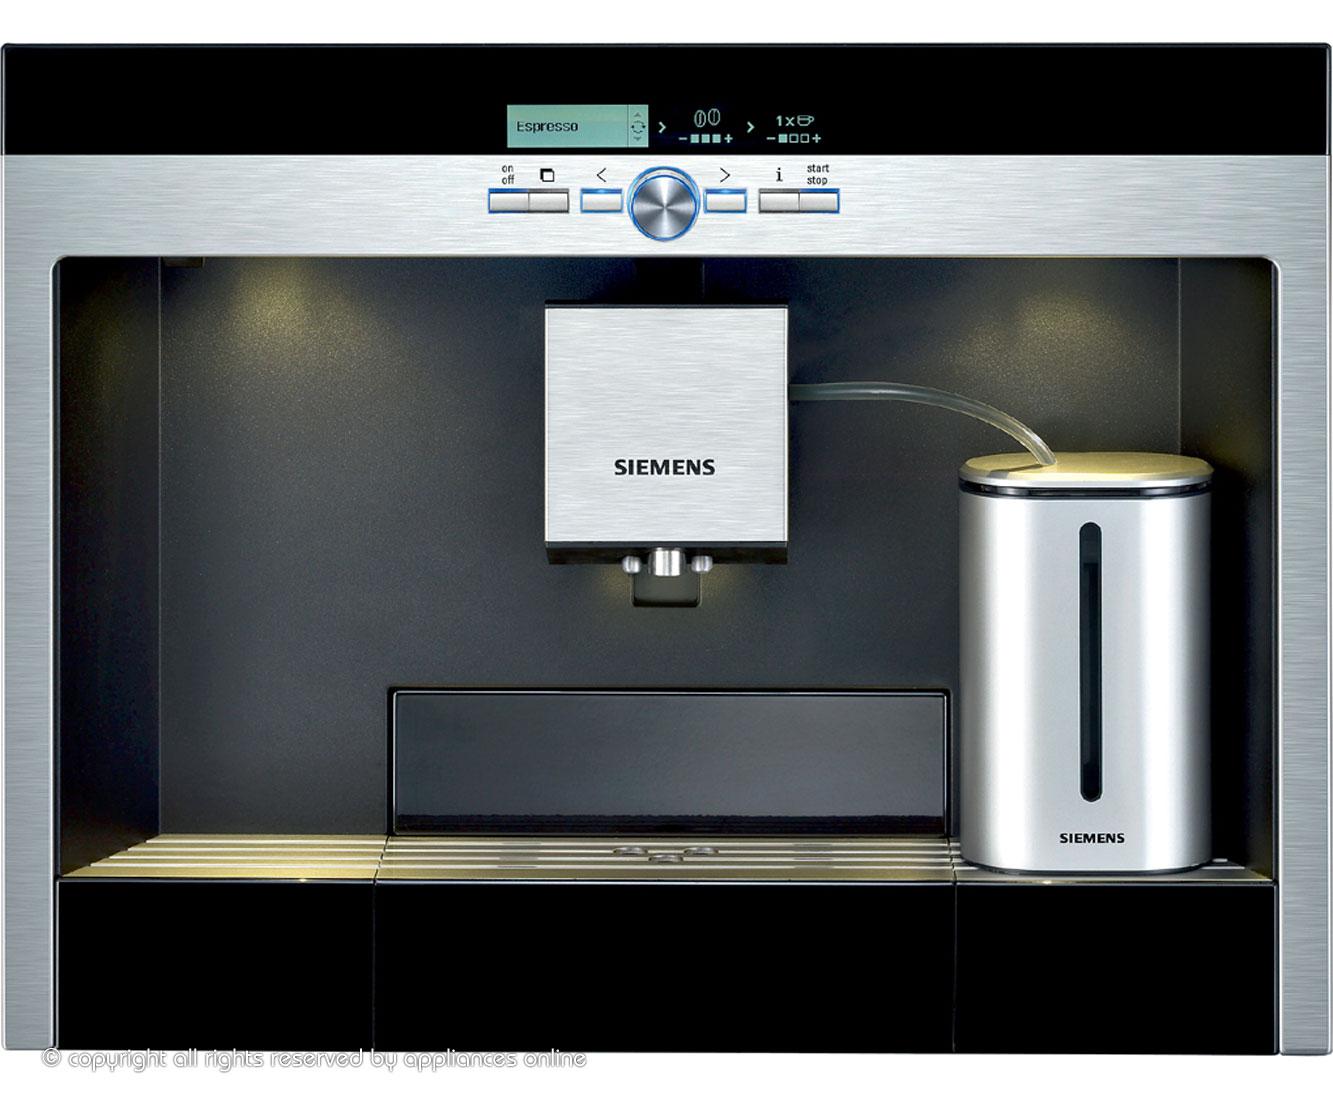 Siemens-coffee-machine-3.jpg